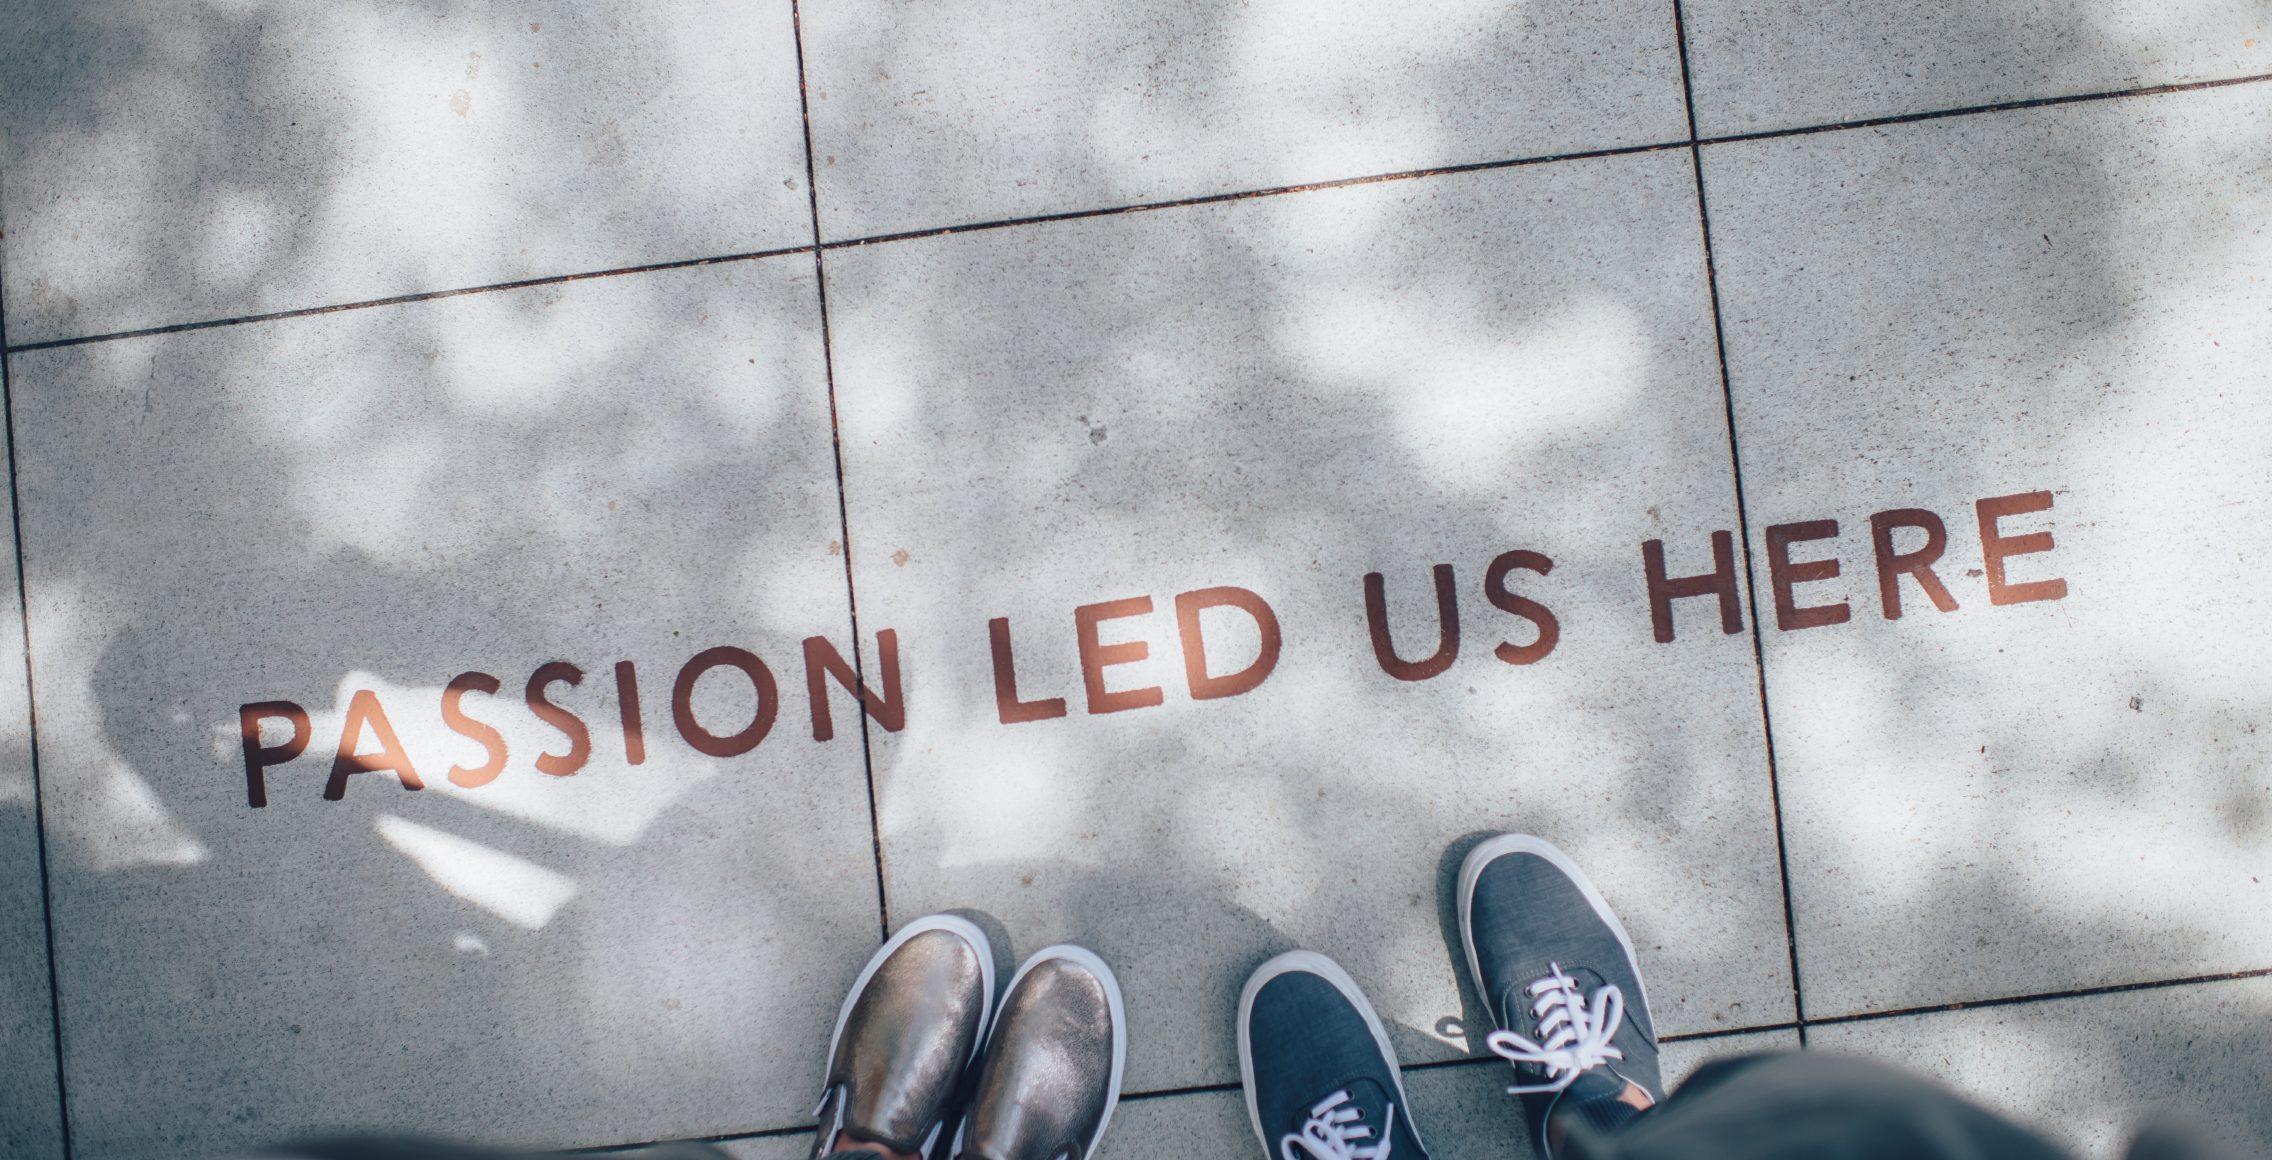 passion led us here written on sidewalk